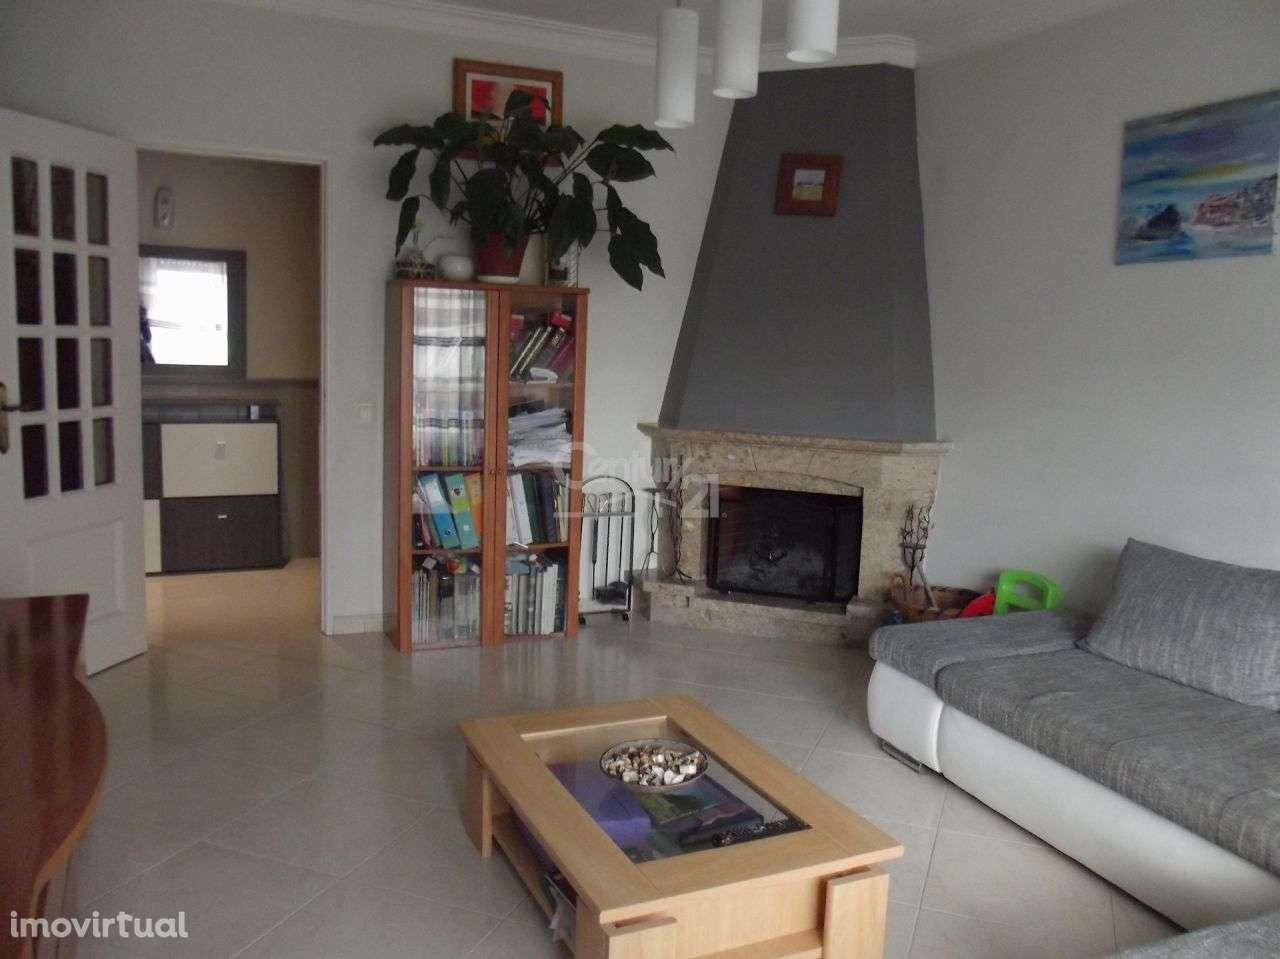 Apartamento para comprar, Quinta do Conde, Setúbal - Foto 2